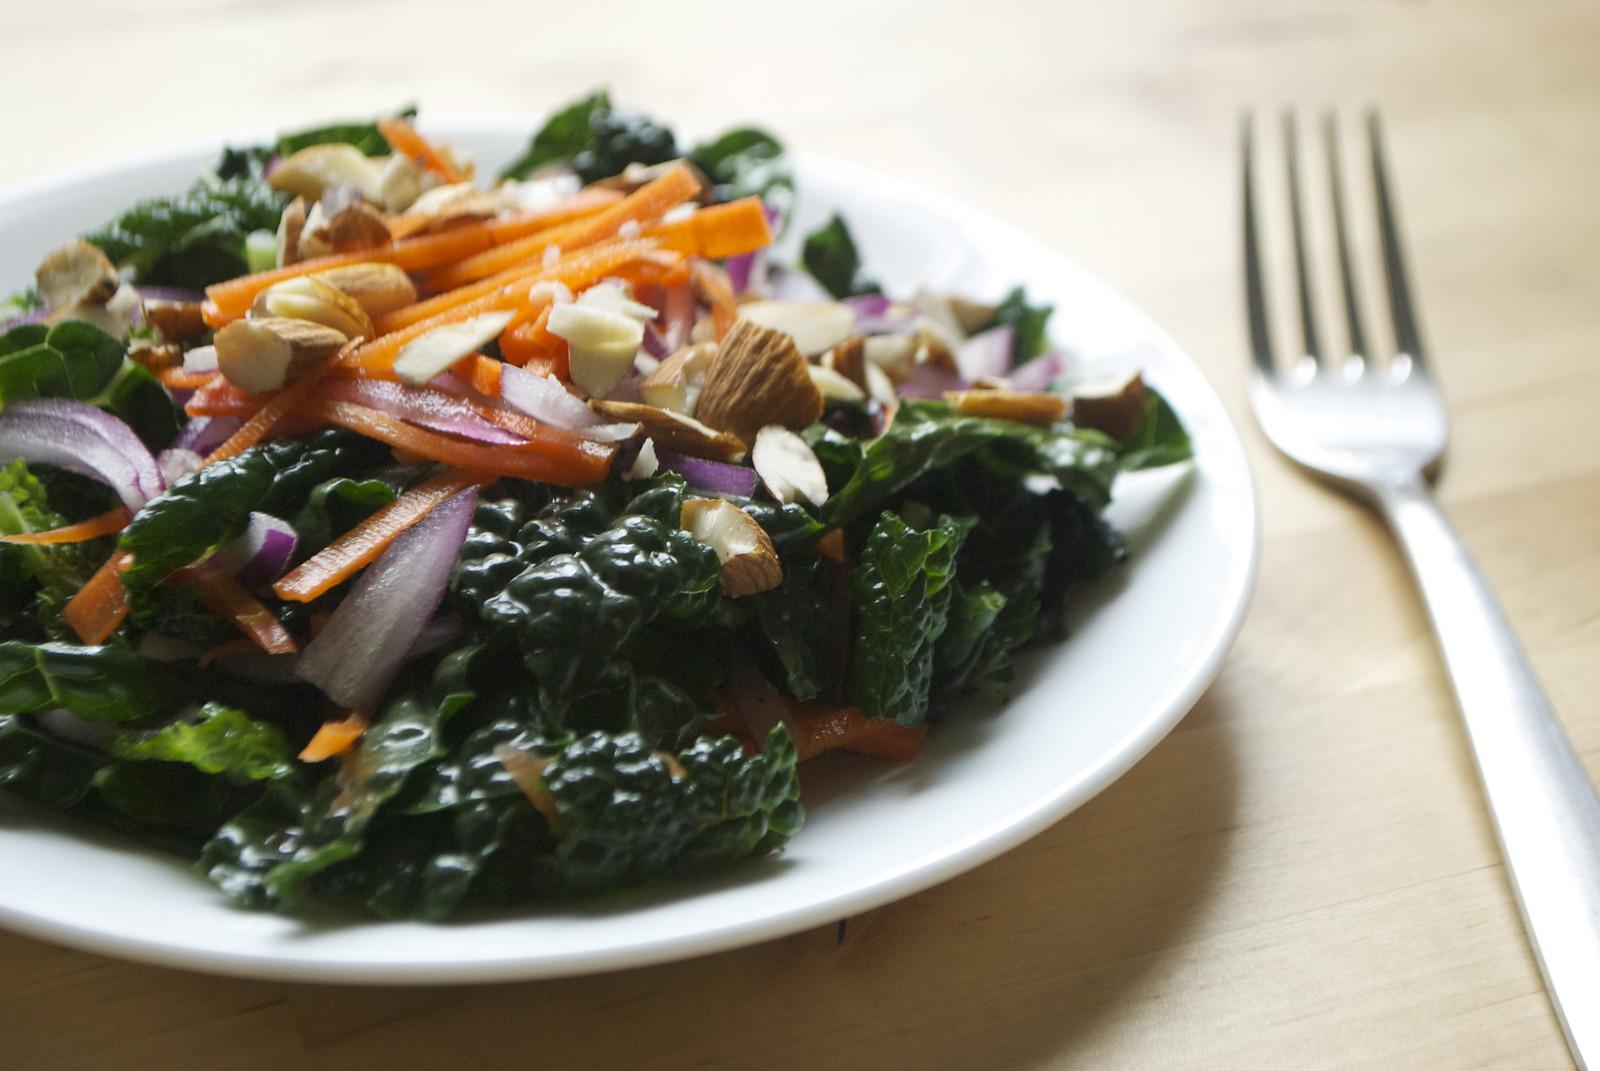 Kale Carrot Salad with Orange Vinaigrette